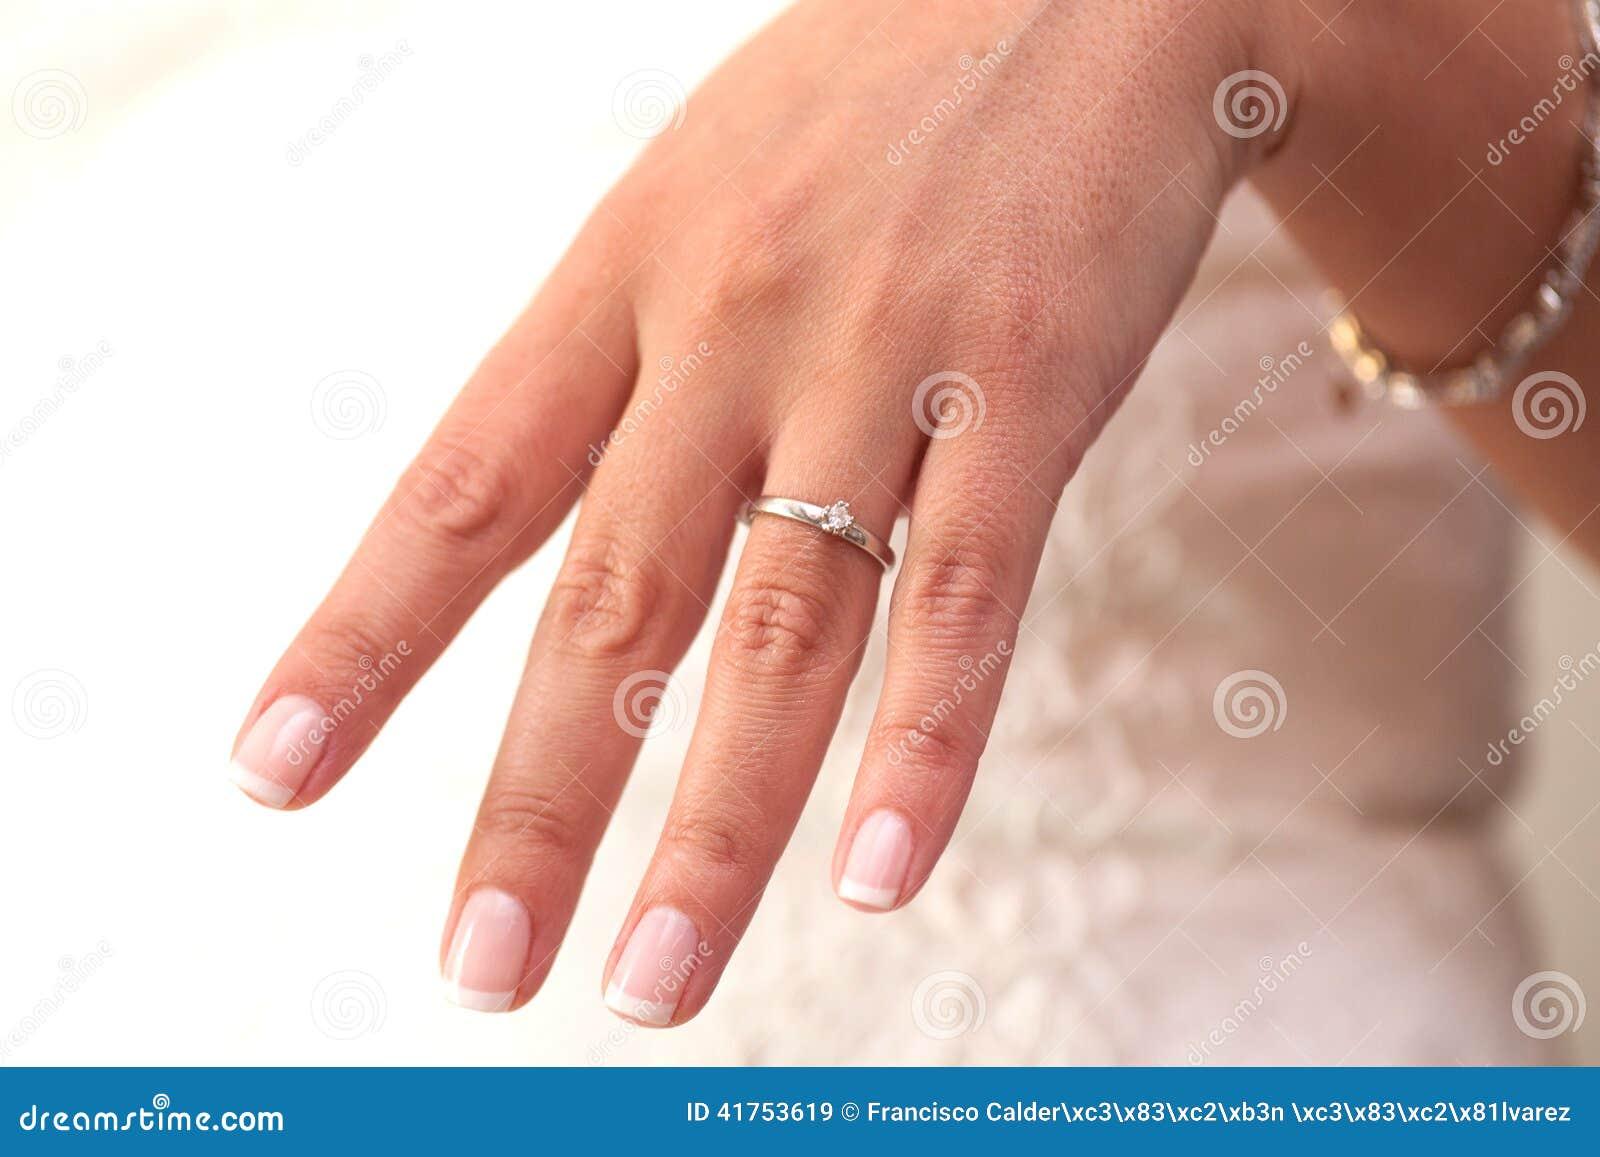 French Wedding Ring Designers